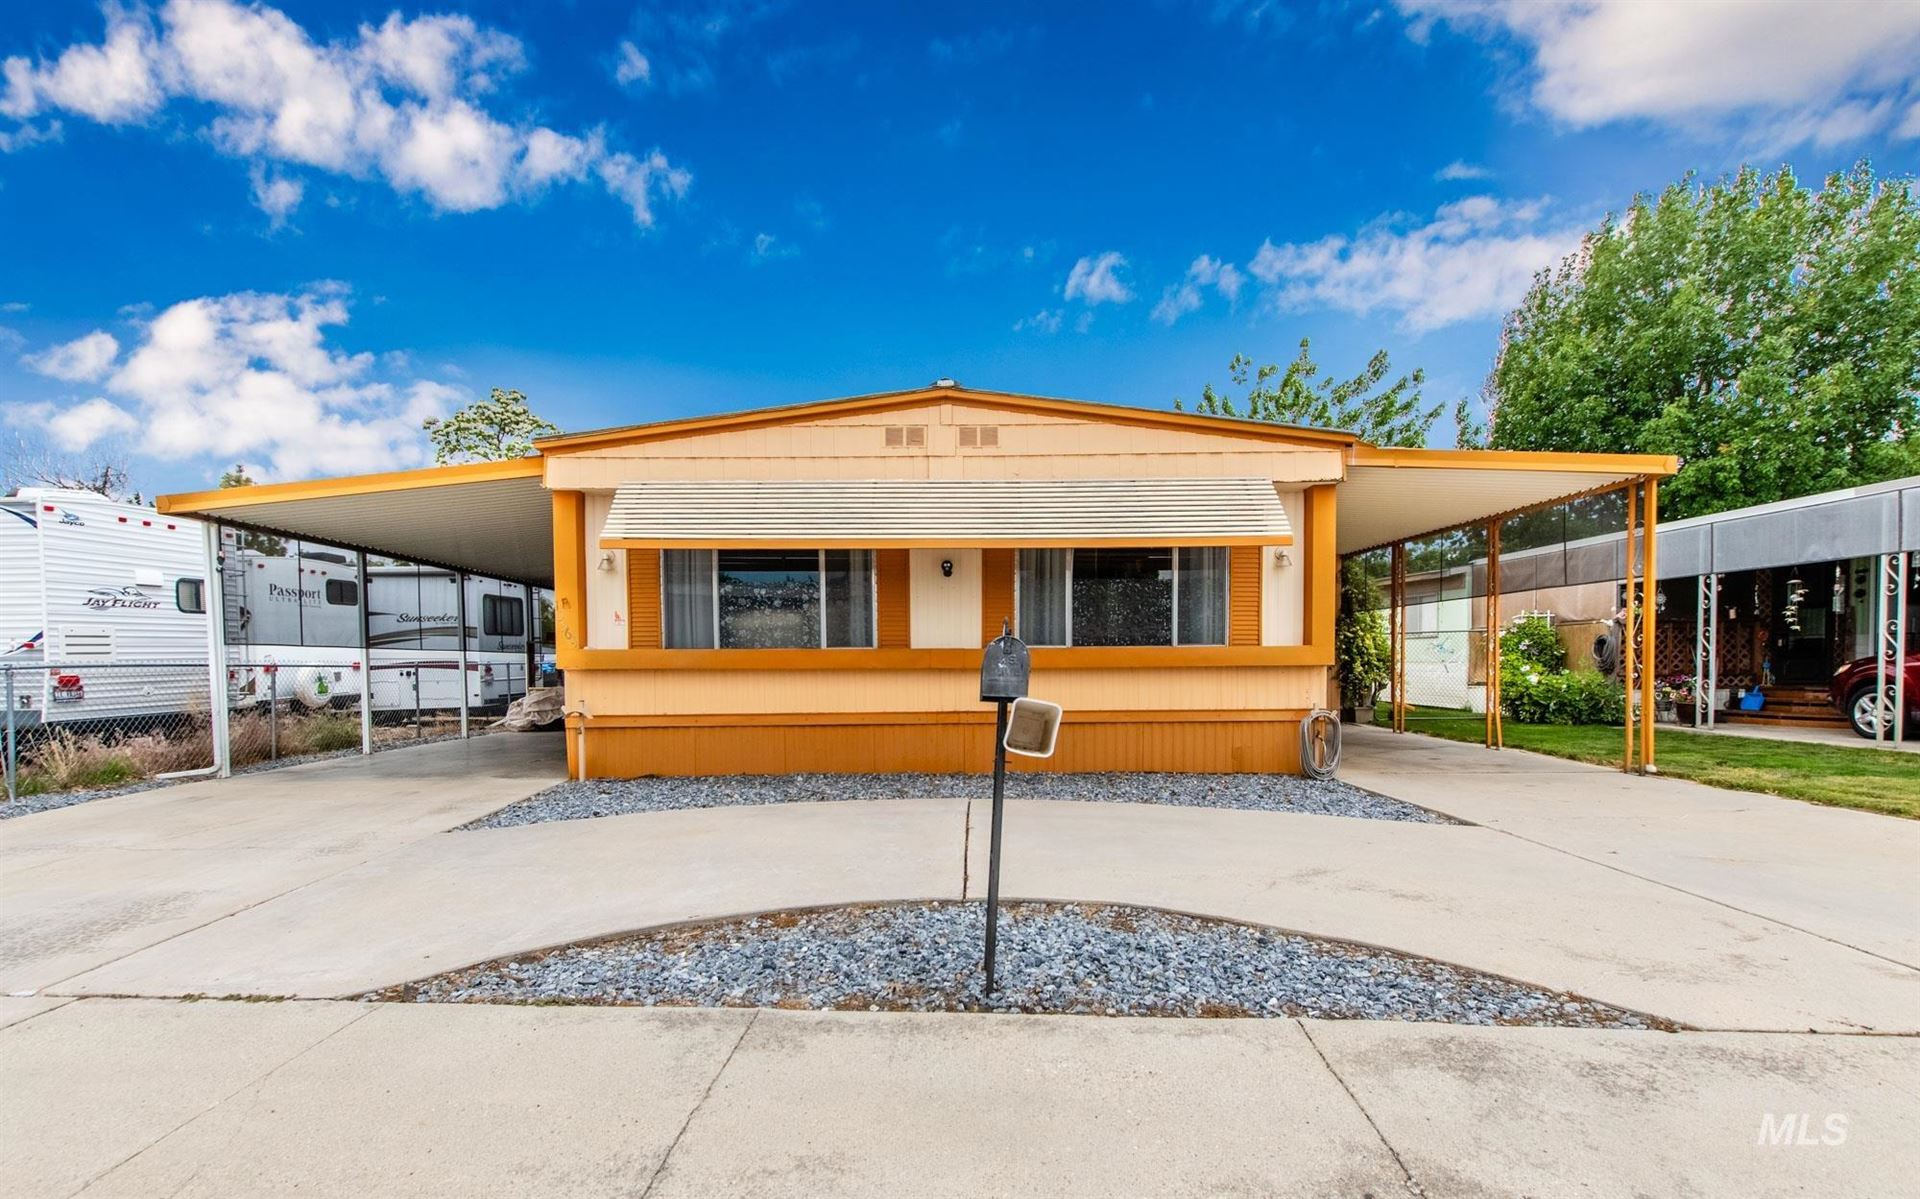 Photo of 10964 W Palm Drive, Boise, ID 83713 (MLS # 98806447)